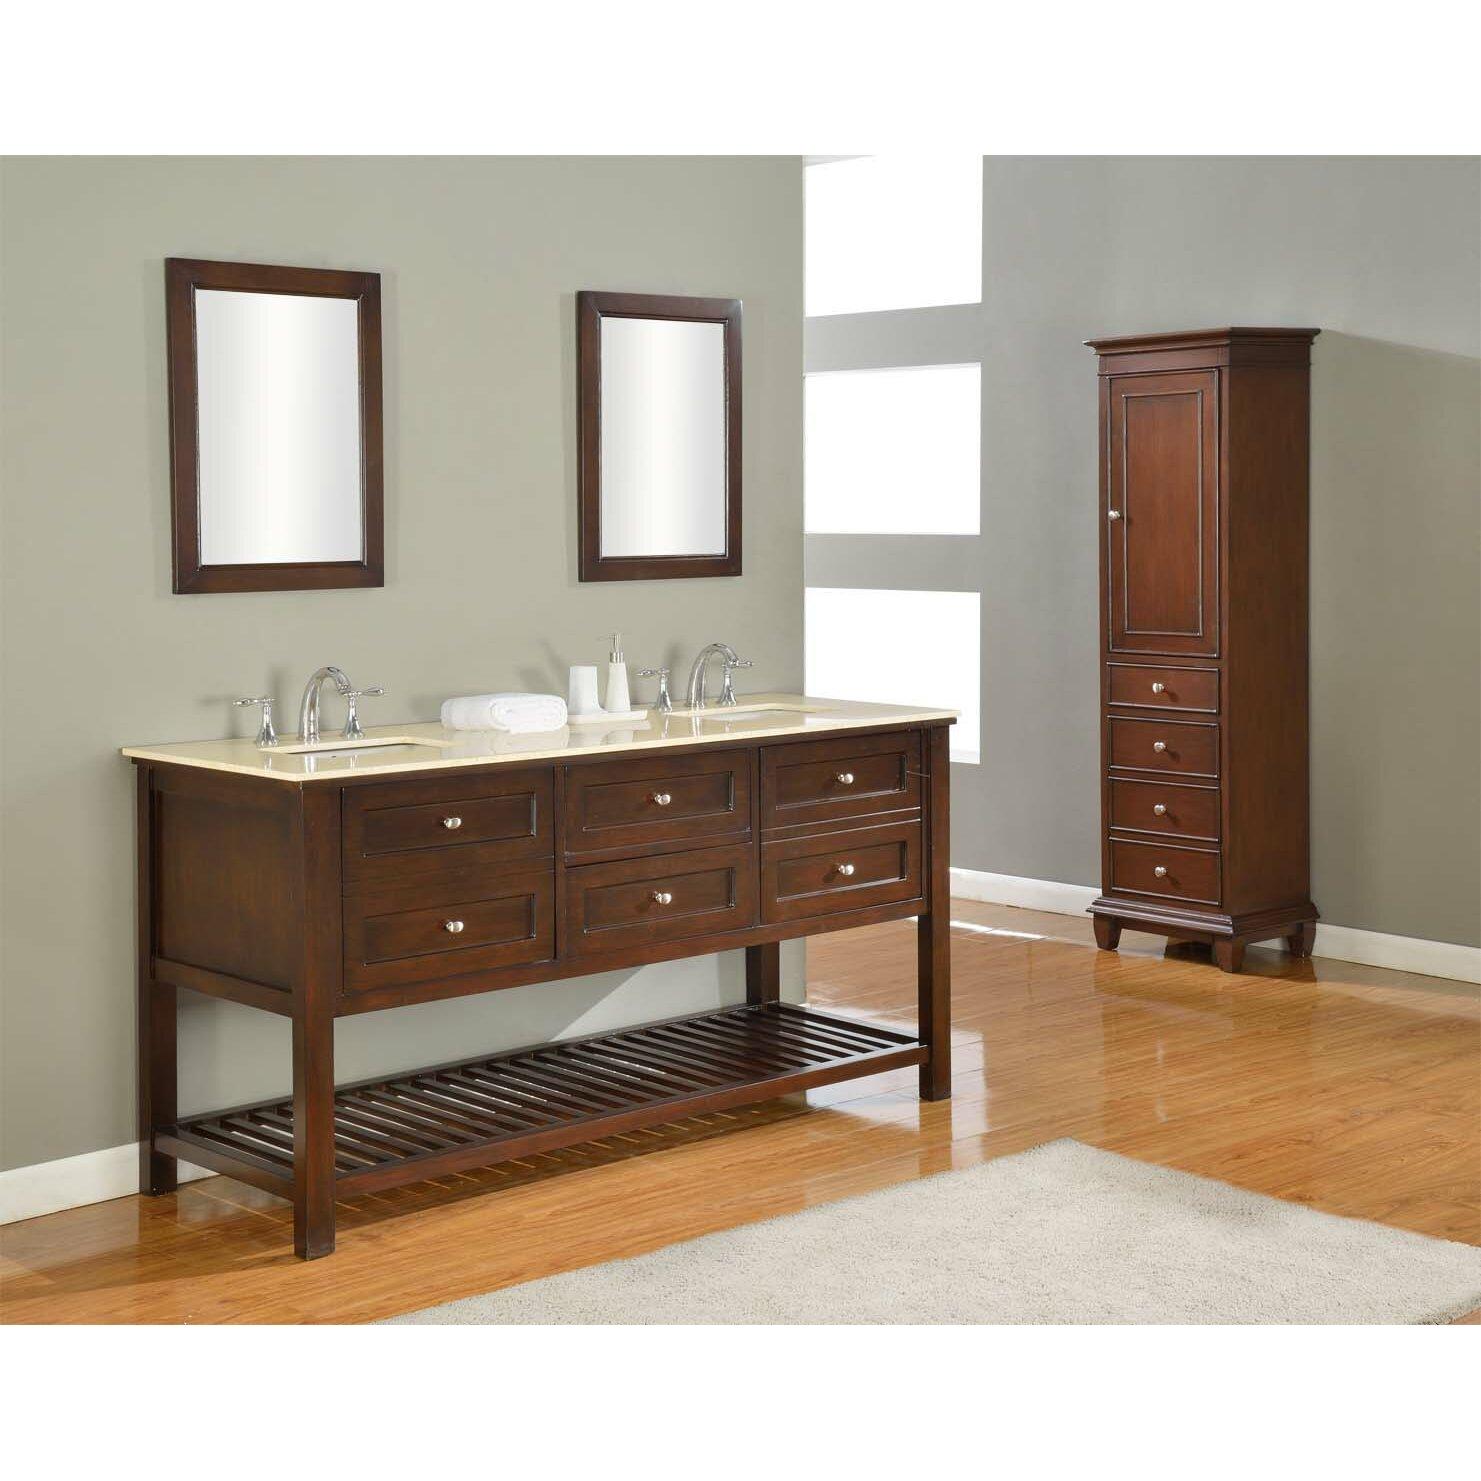 Direct Vanity Sink Mission Spa 70 Double Bathroom Vanity Set Revi